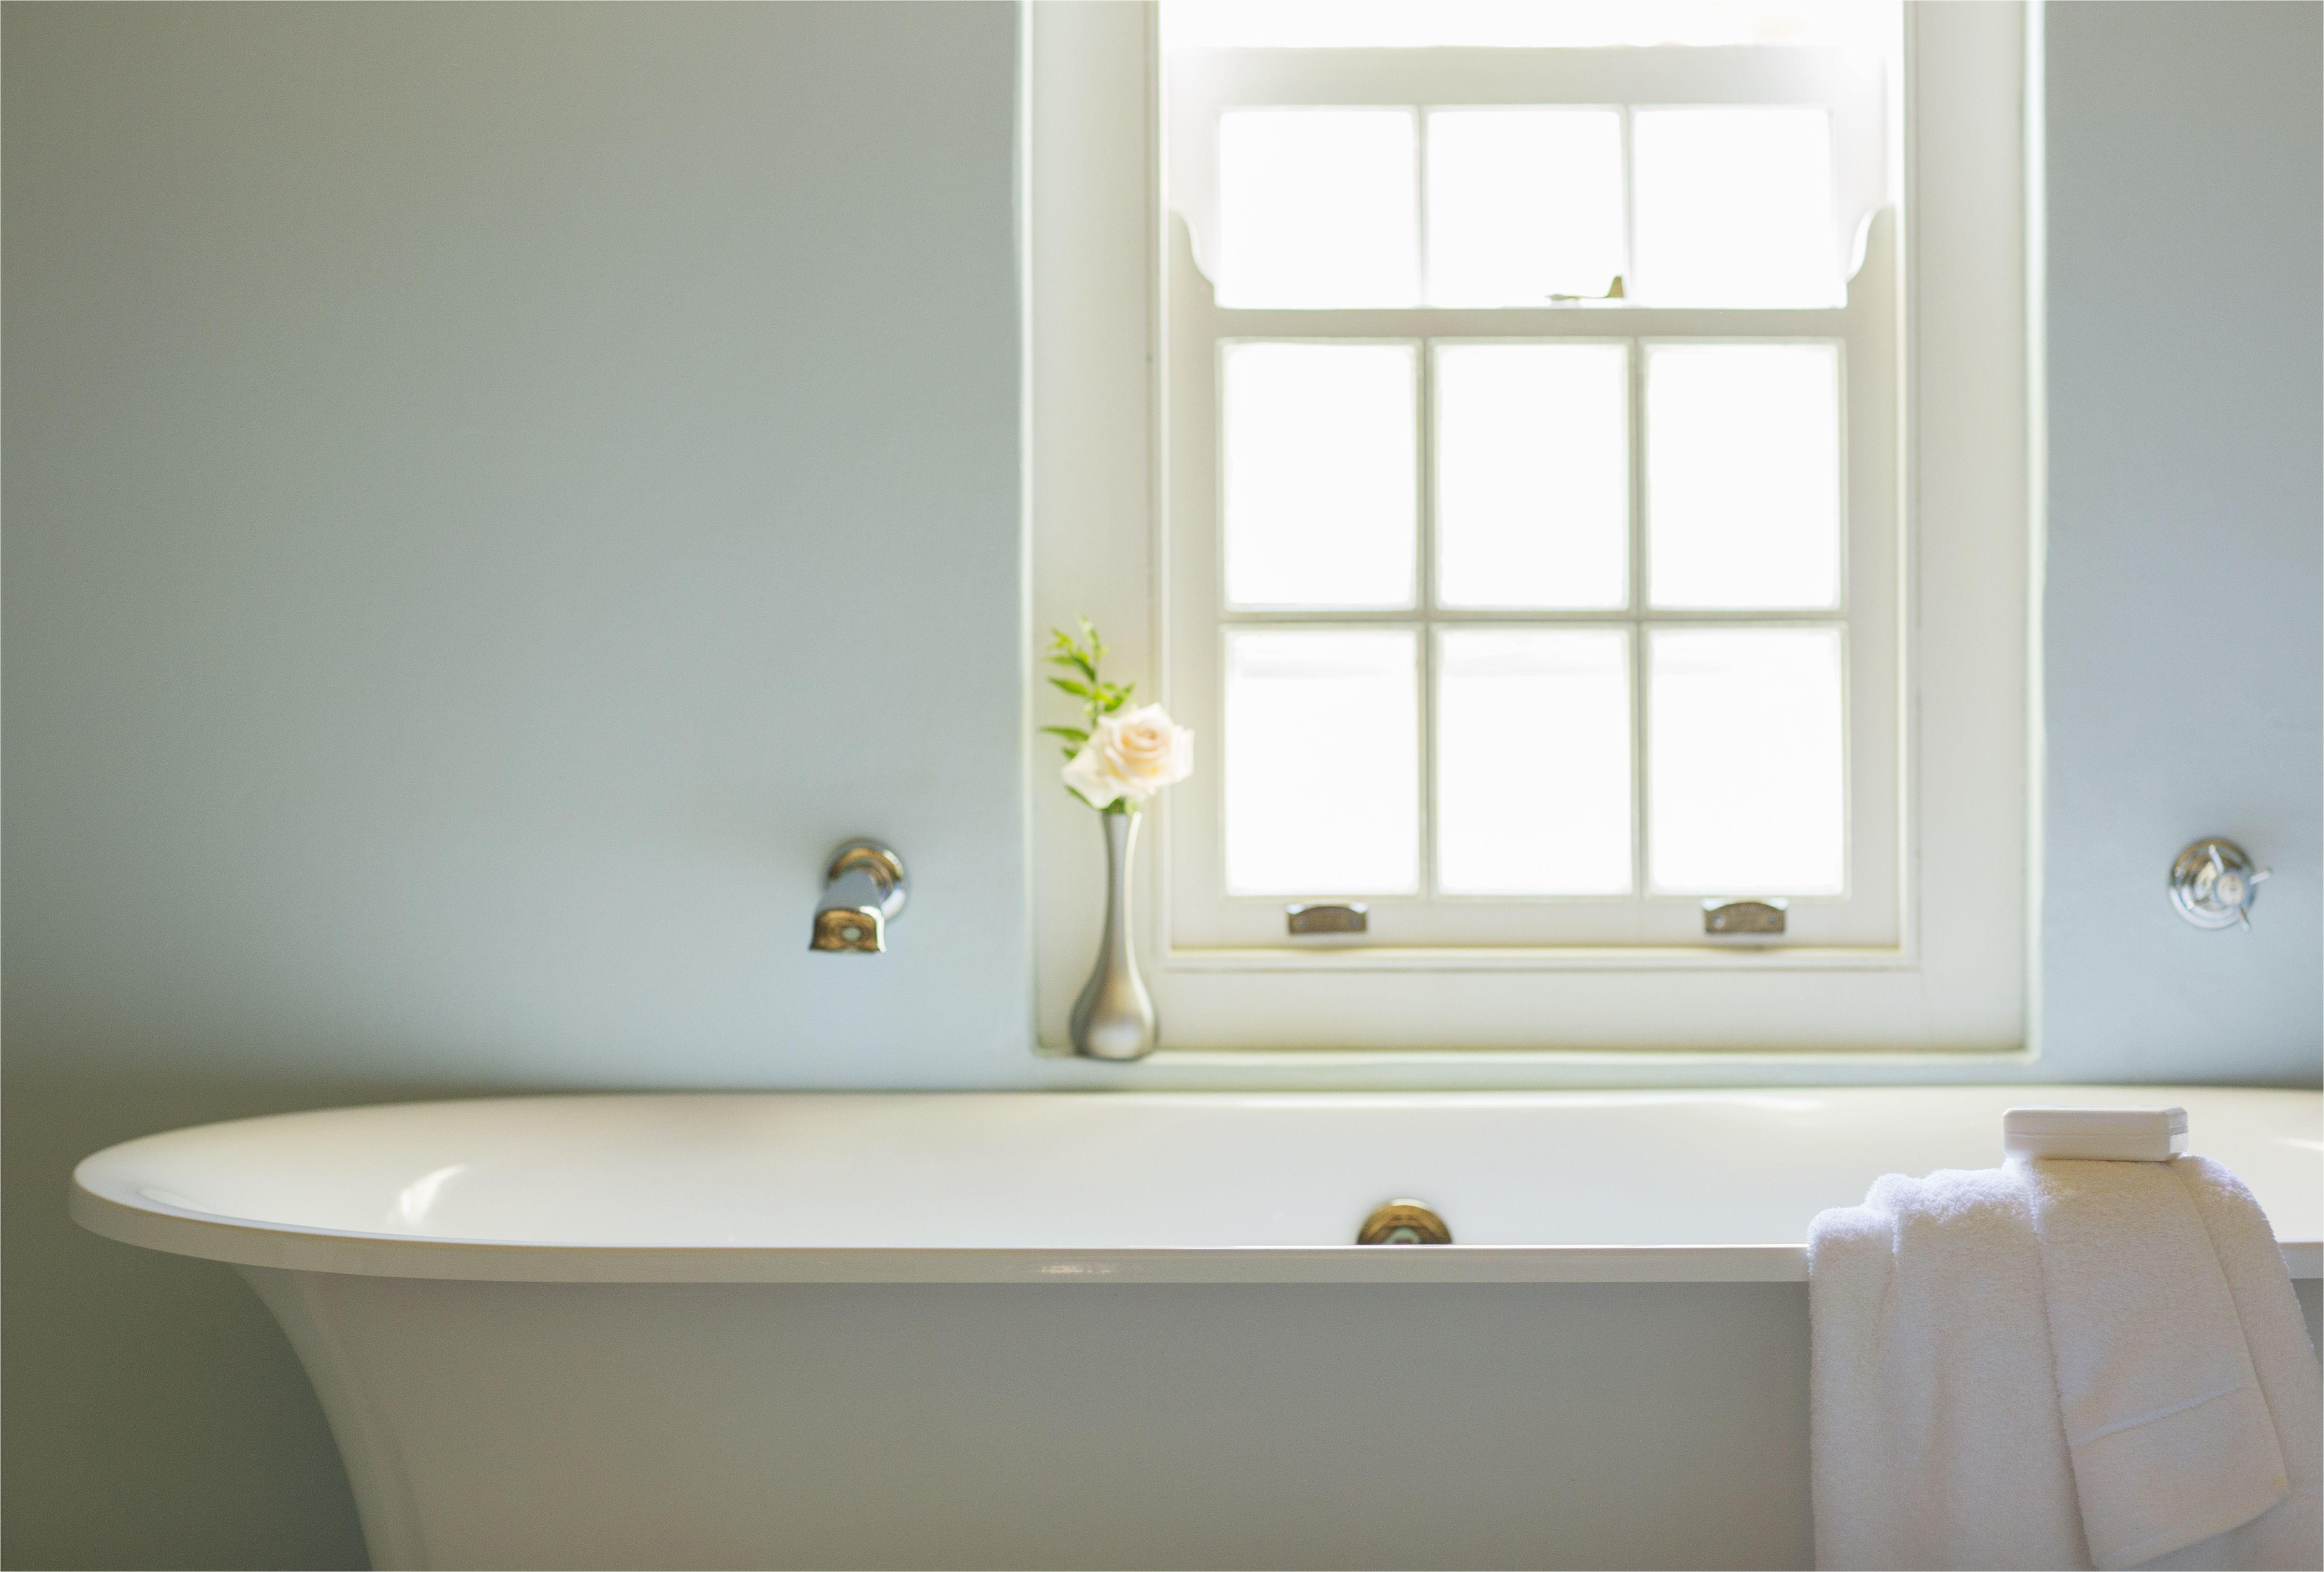 soaking tub below window in luxury bathroom 494358425 5aa1e931c064710037061882 jpg